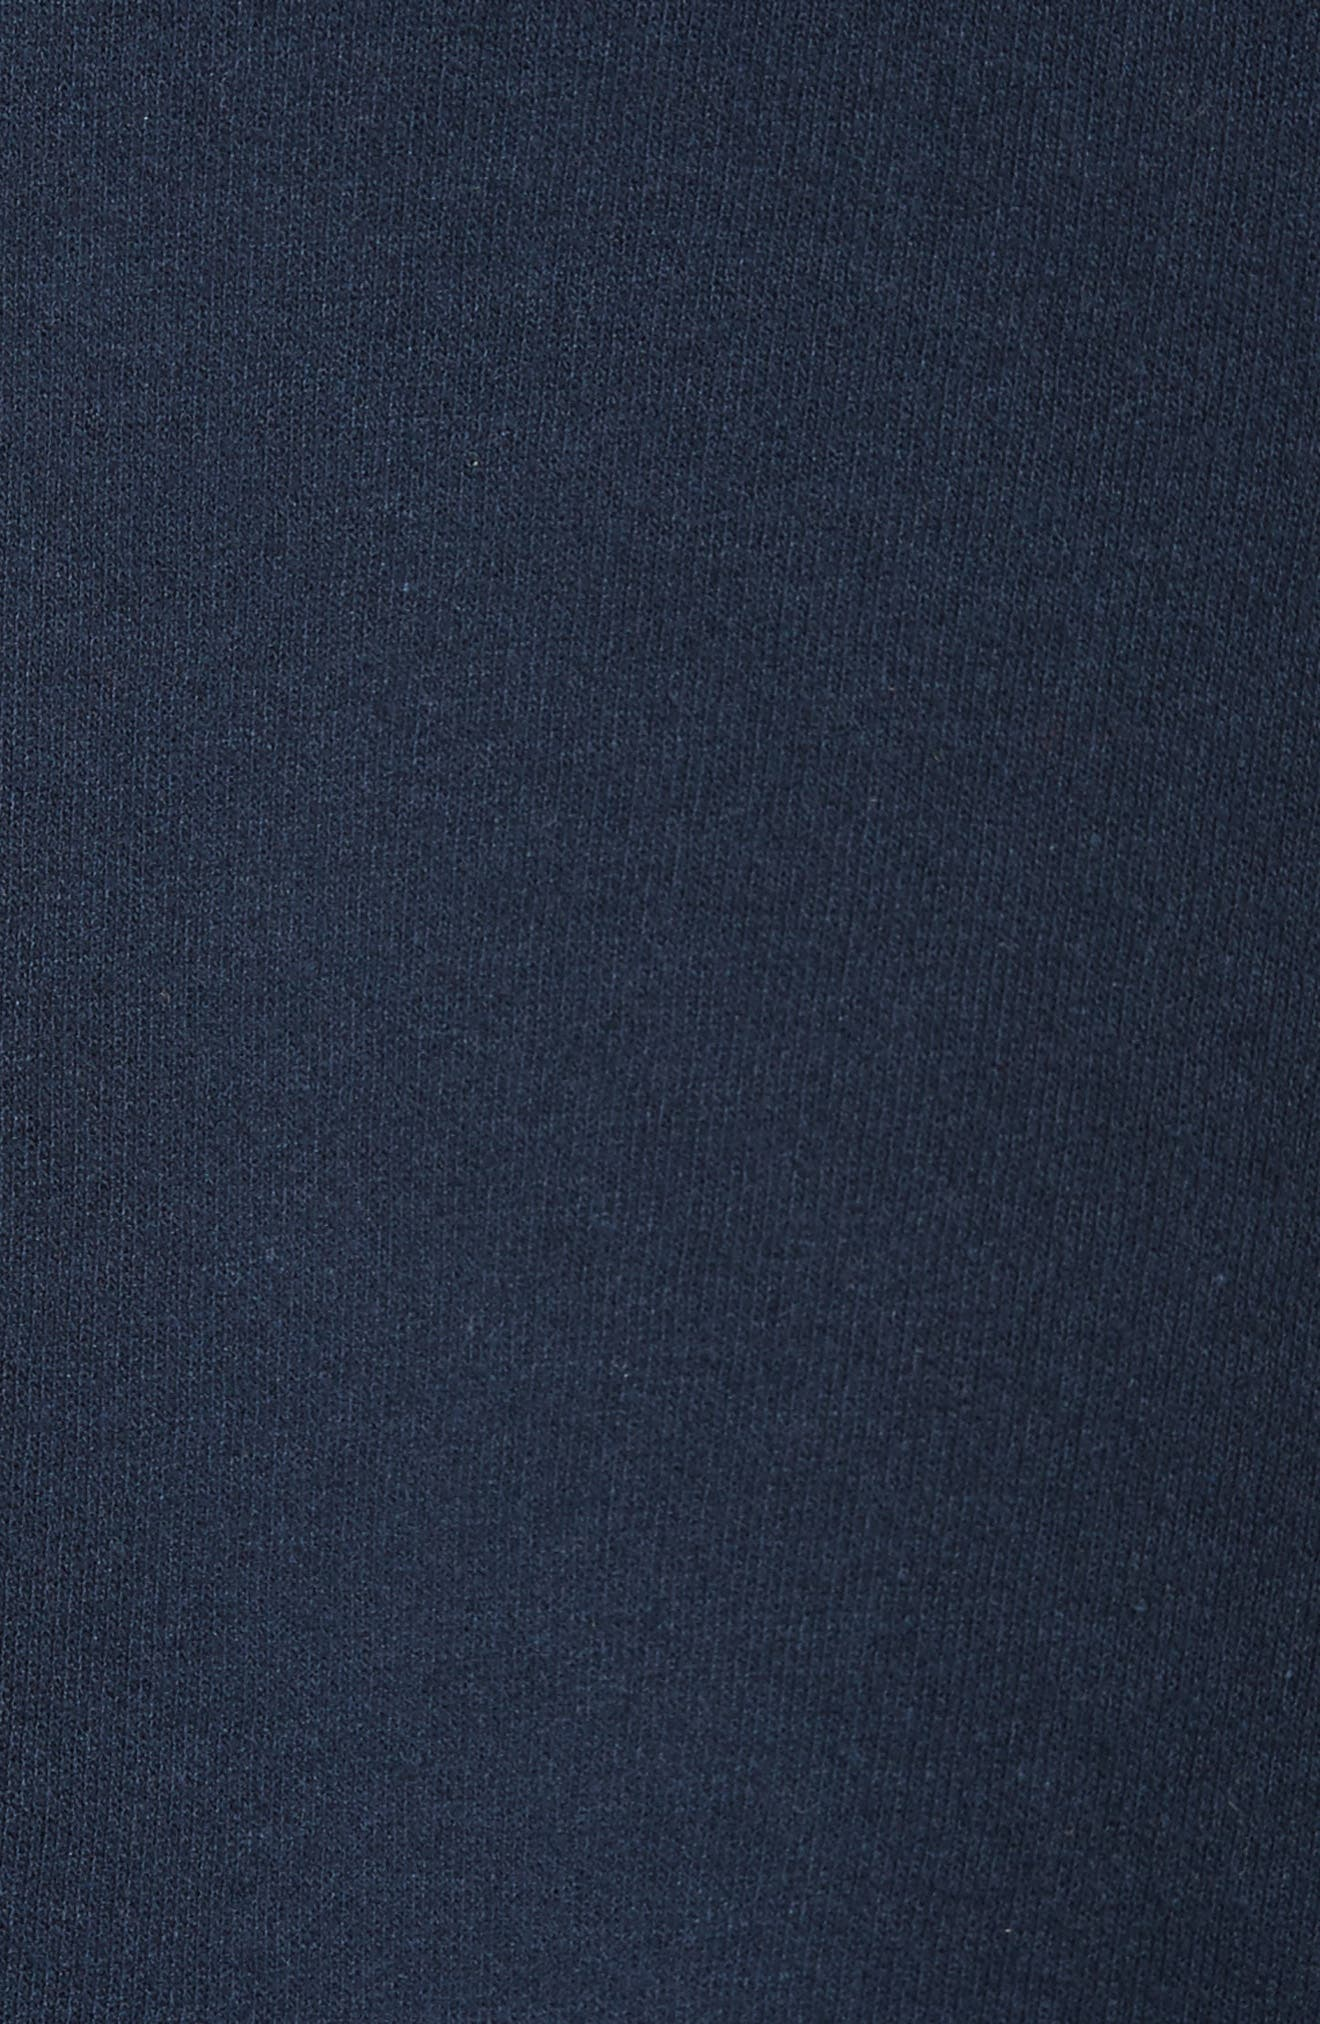 Sequin Sweatshirt Tank,                             Alternate thumbnail 5, color,                             400